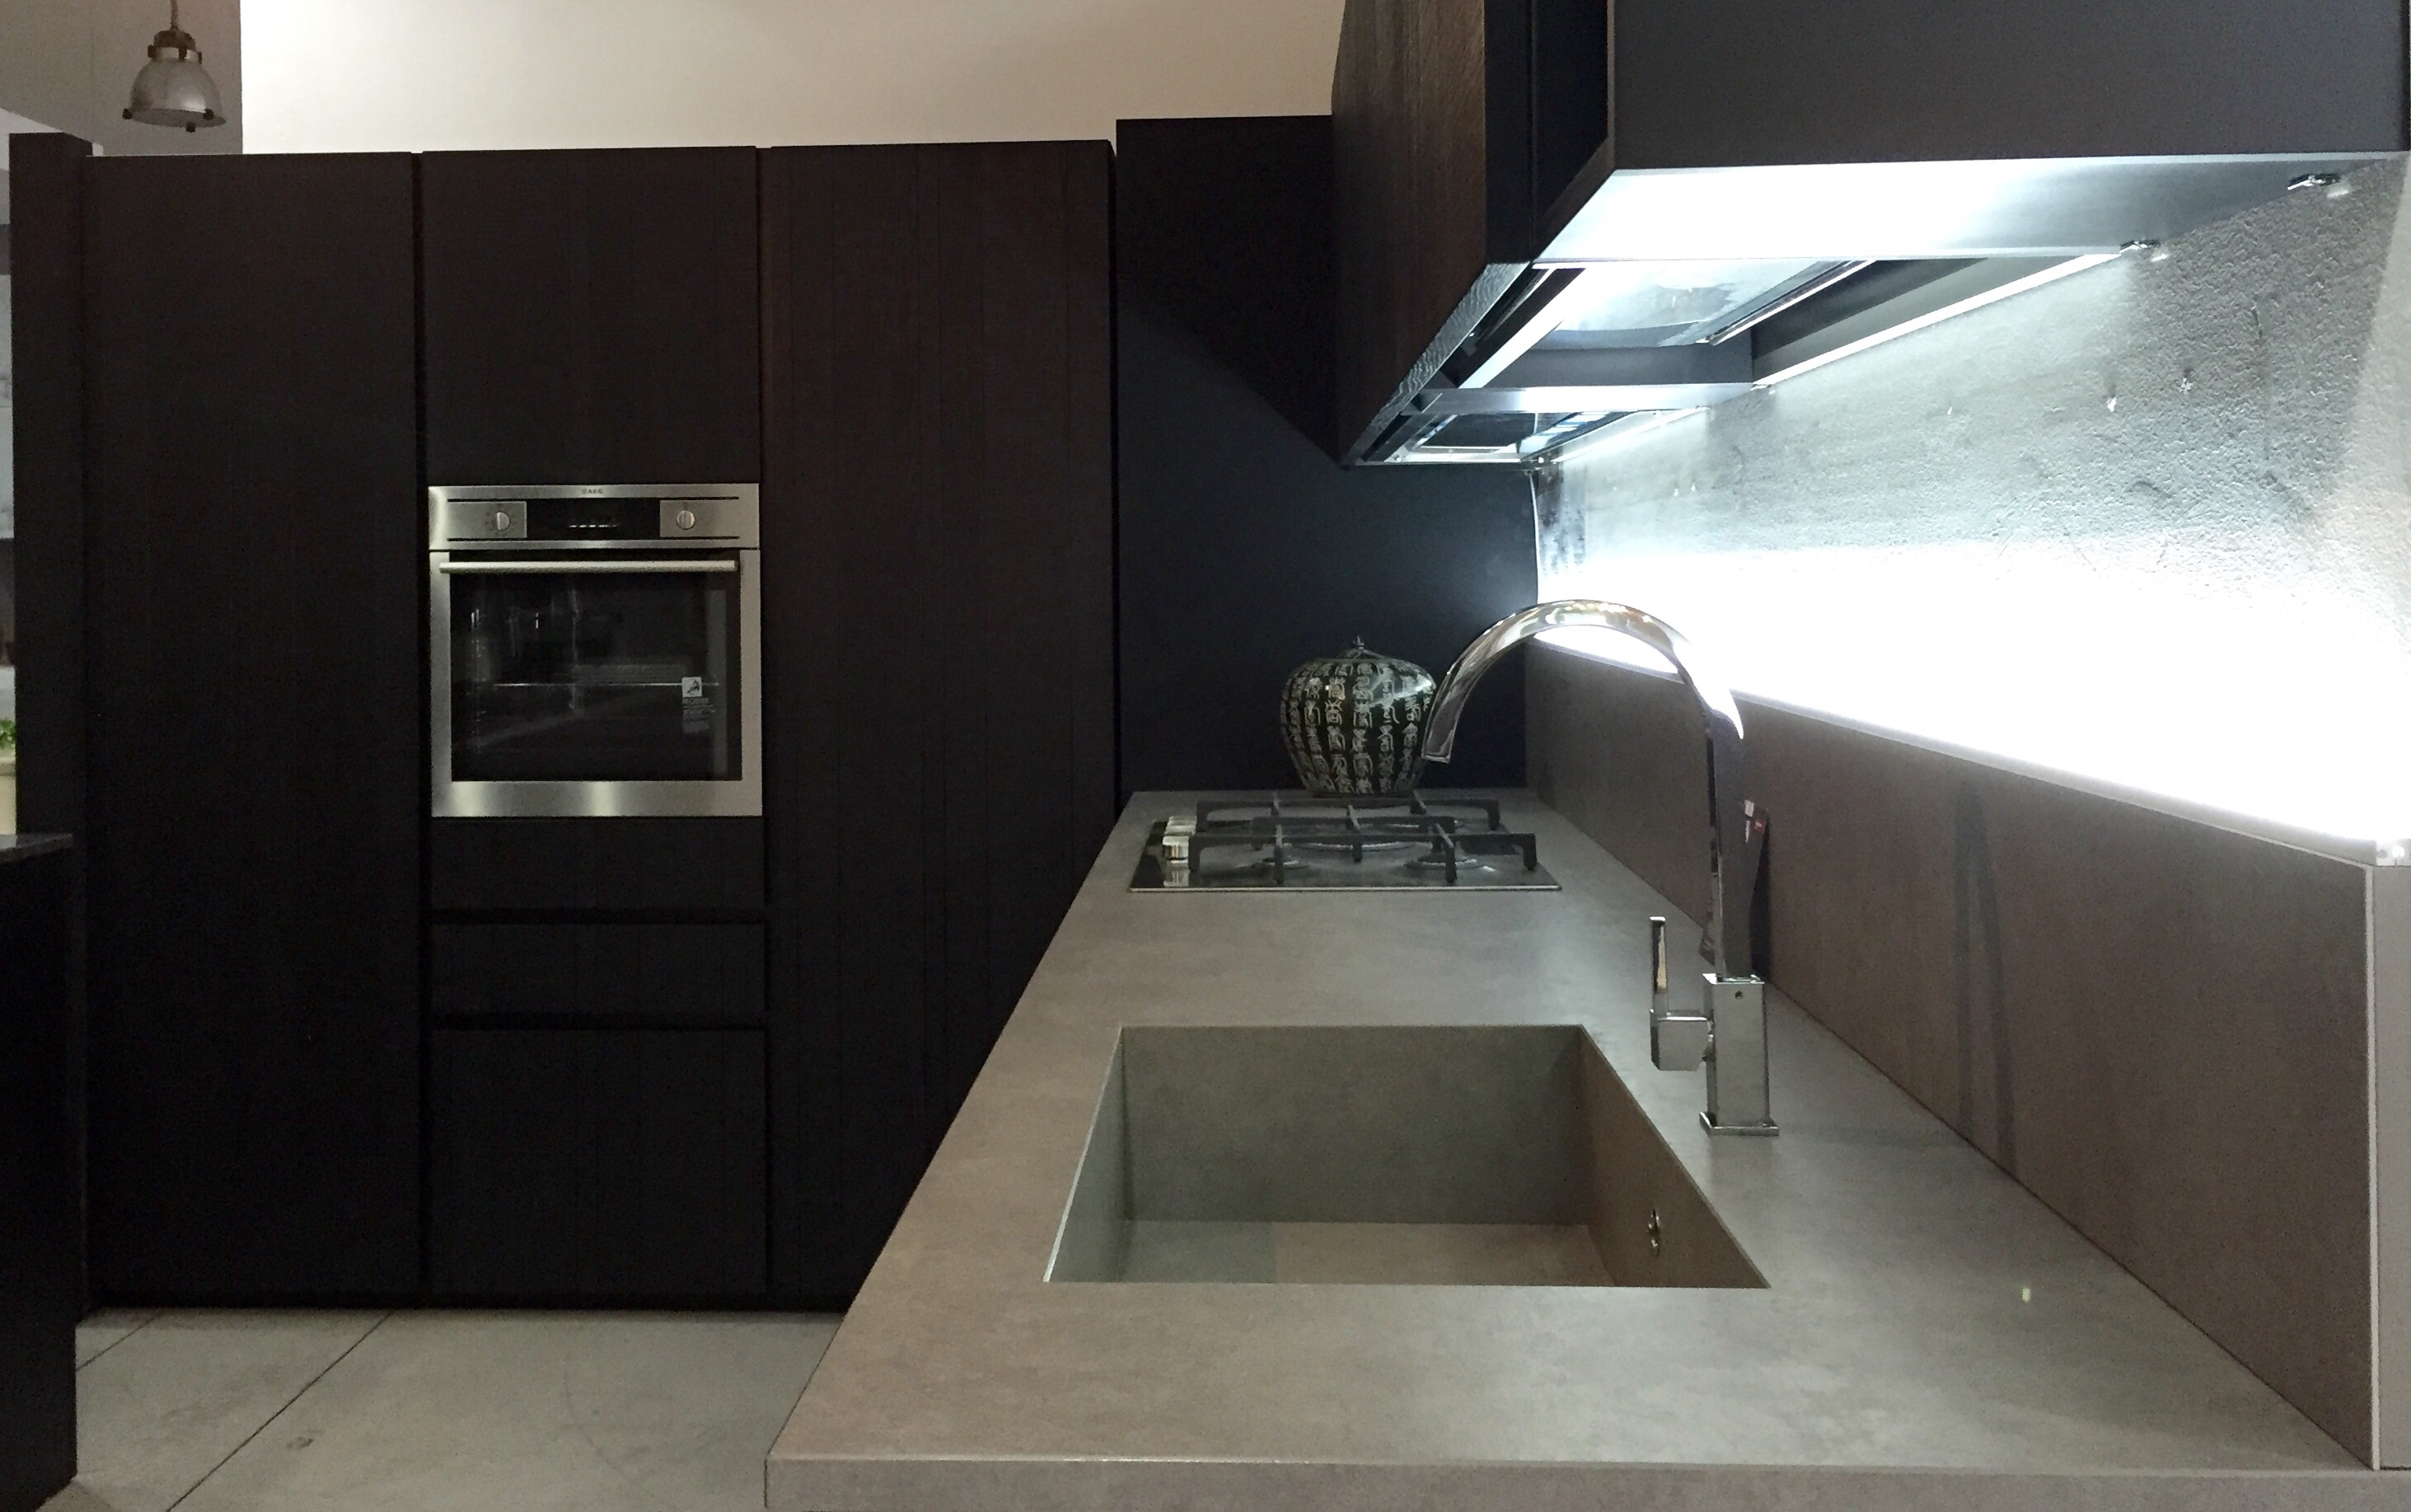 Cucina zampieri cucine glasstone y scontato del 45 - Zampieri cucine showroom ...